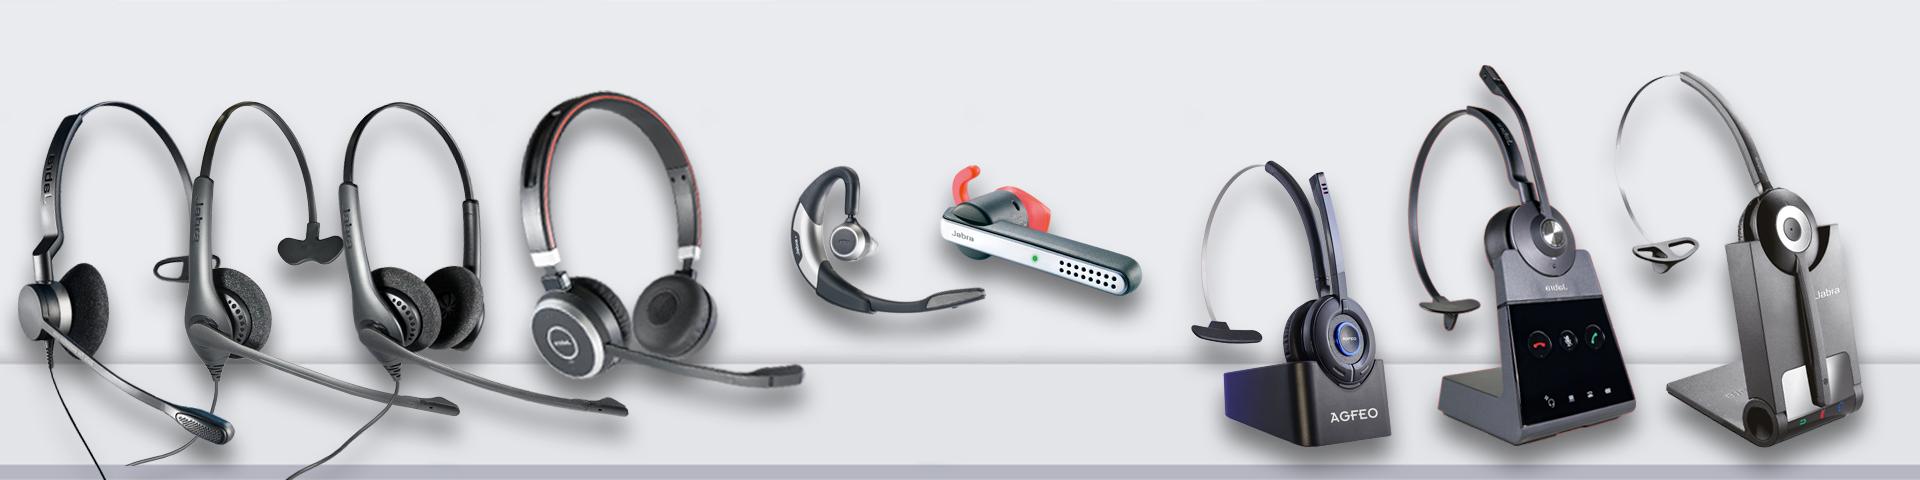 Konferenzsysteme & Headsets